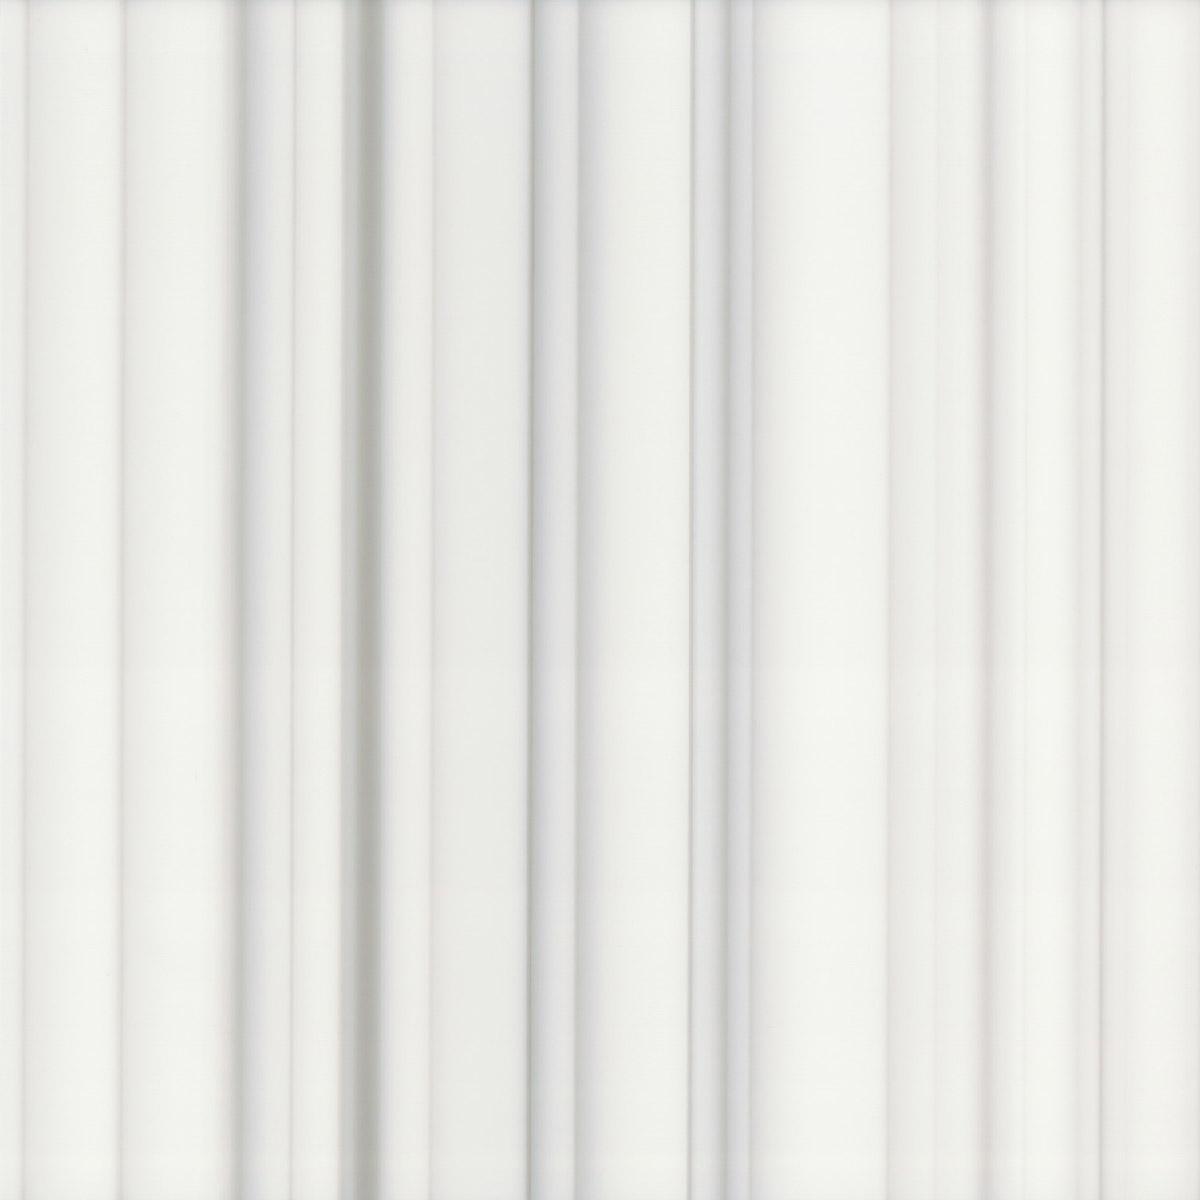 Corian® Silver Linear